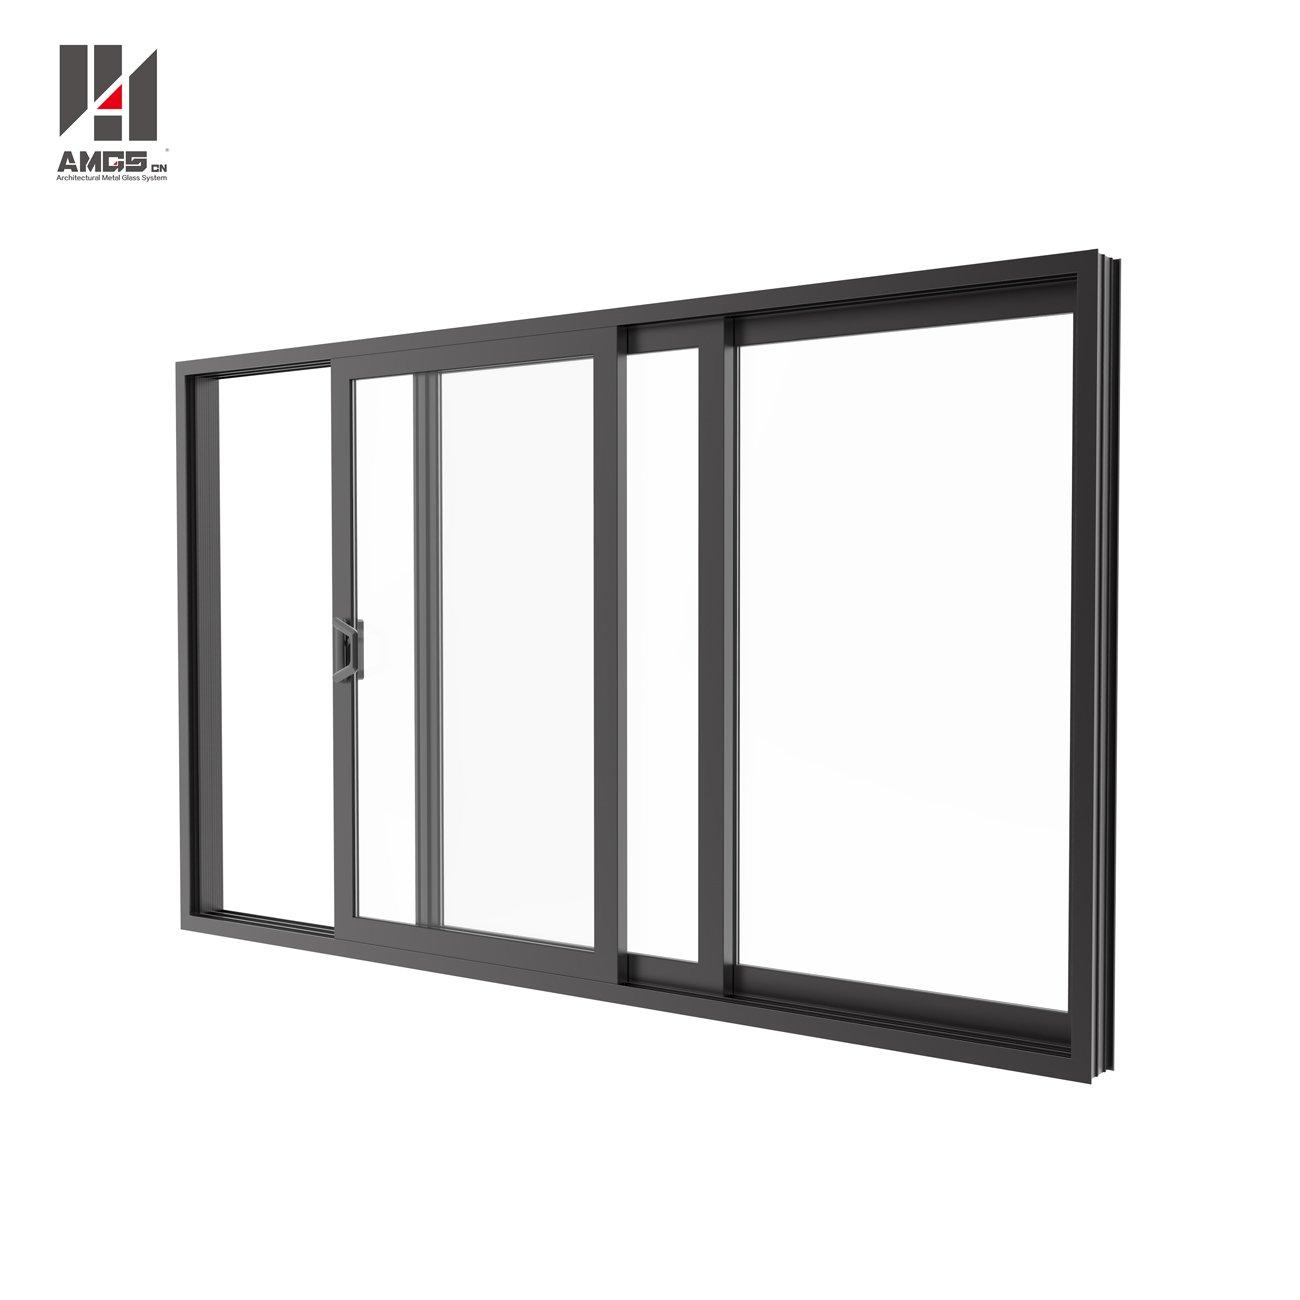 AMGS Aluminium Profile Sliding Glass Doors For Double Glass Aluminum Sliding Doors image14